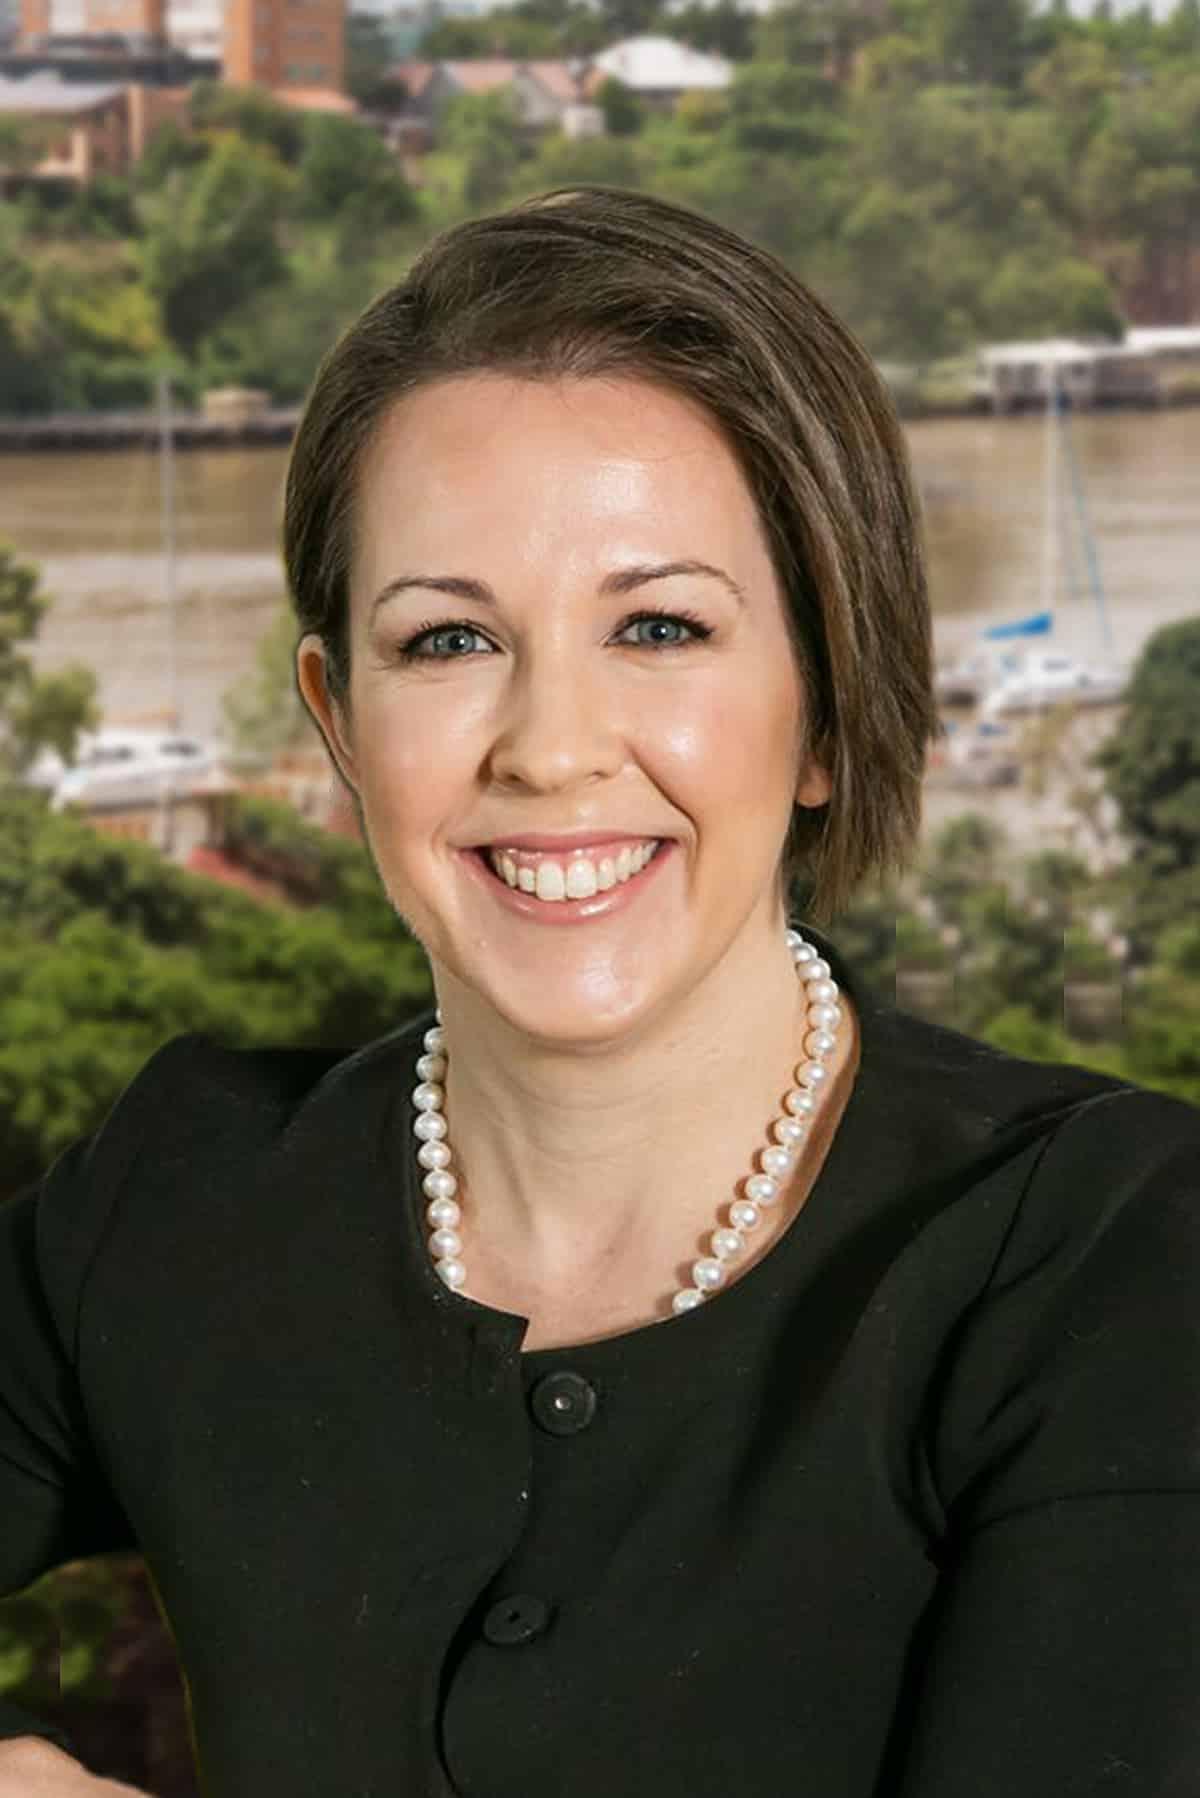 Kate Varcoe